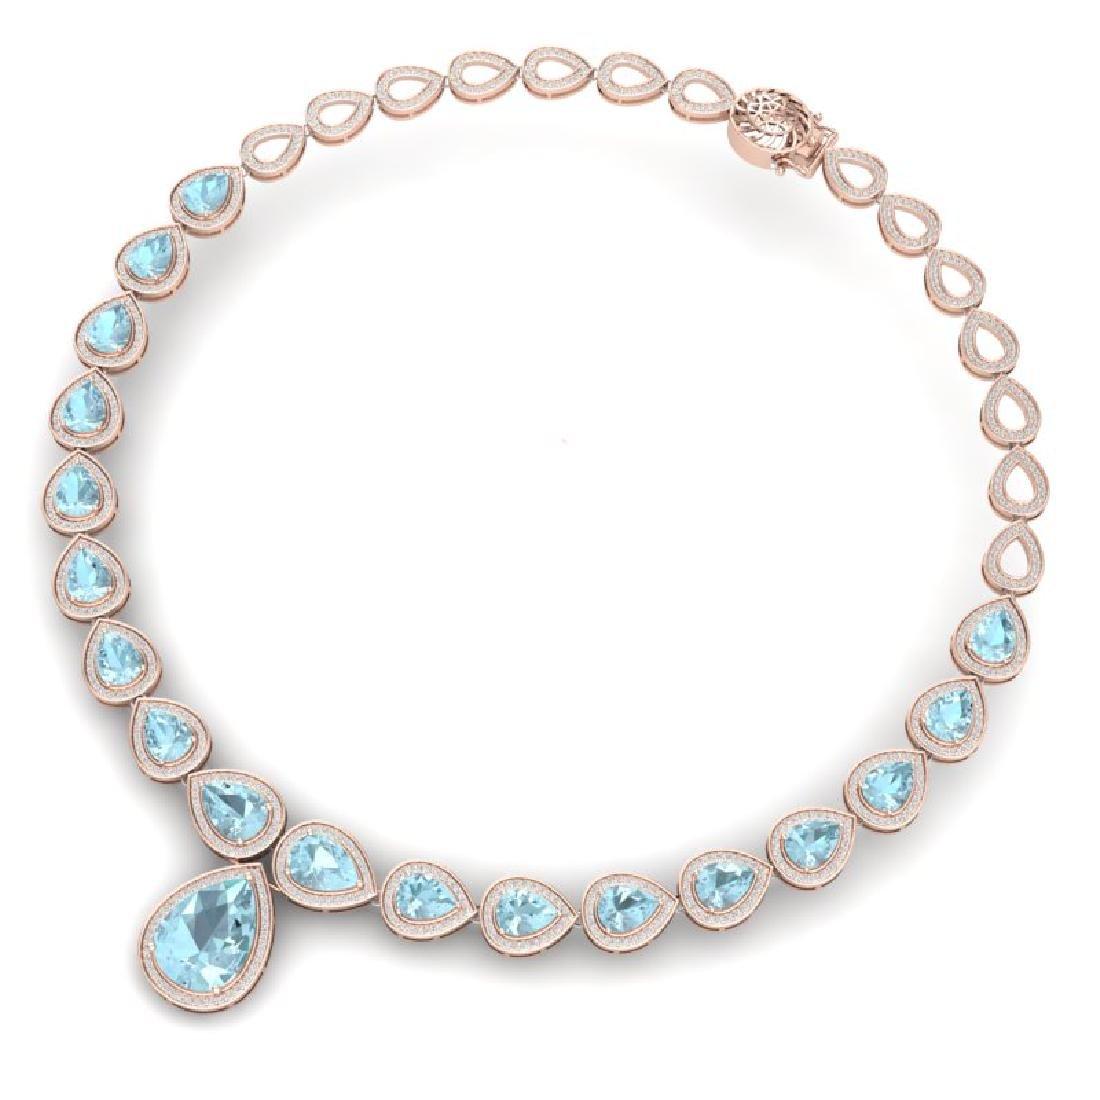 54 CTW Royalty Sky Topaz & VS Diamond Necklace 18K Rose - 3